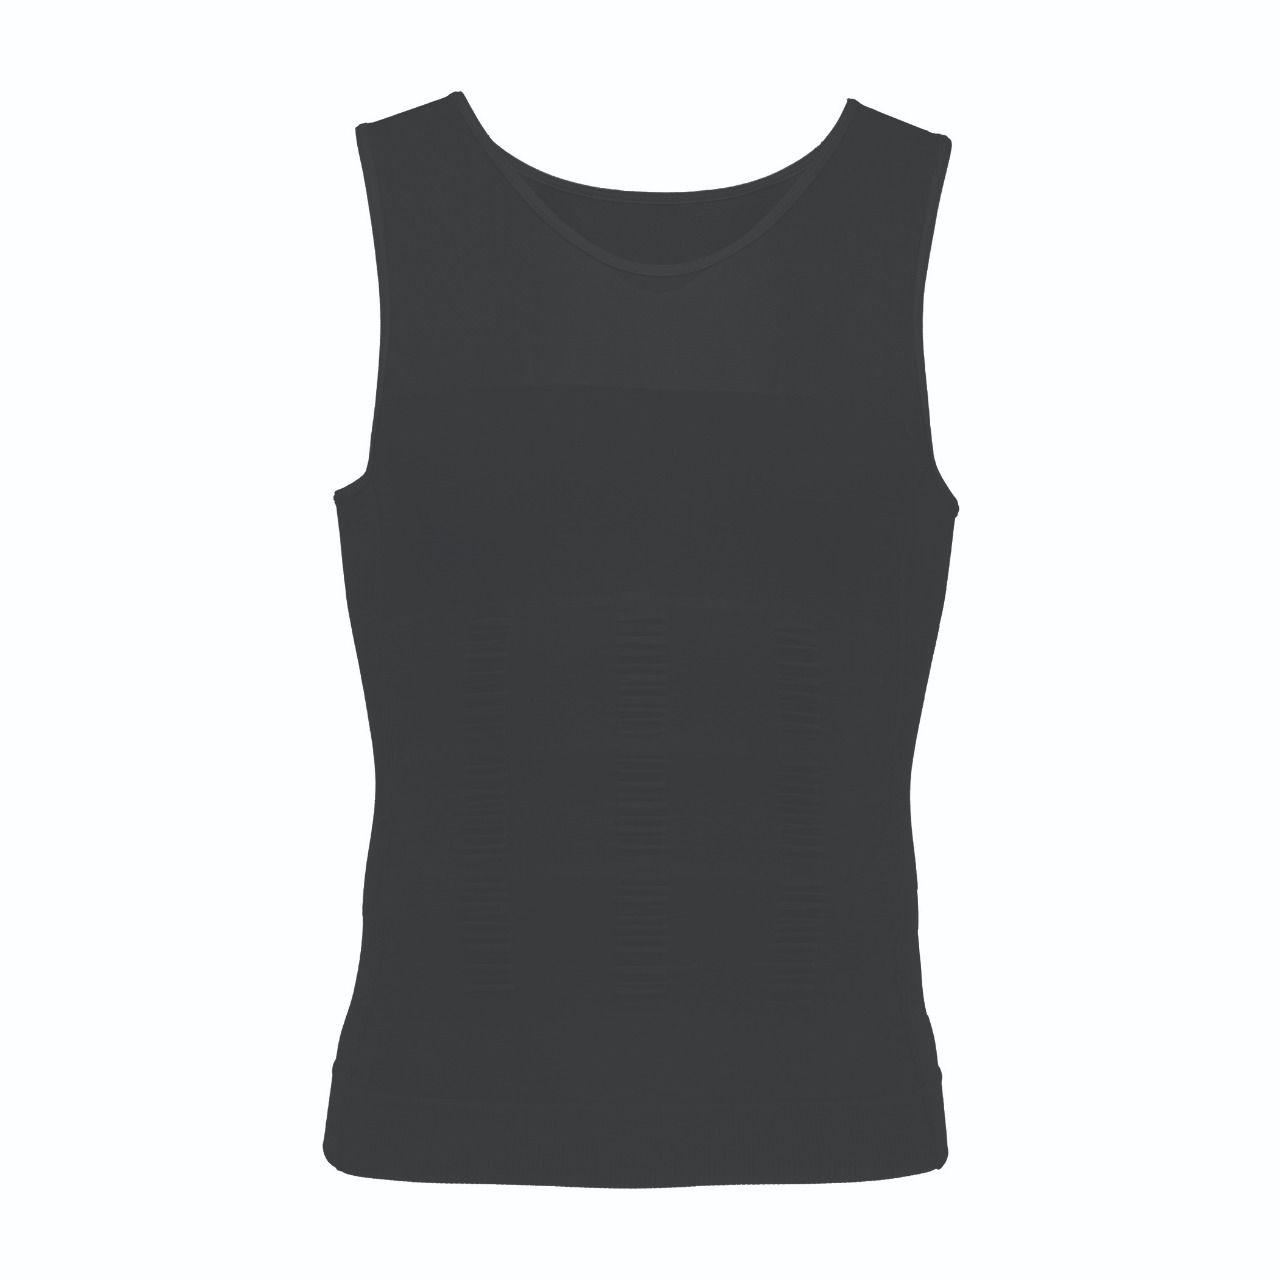 Regata Modeladora Masculina Trifil Corrige Postura C00971